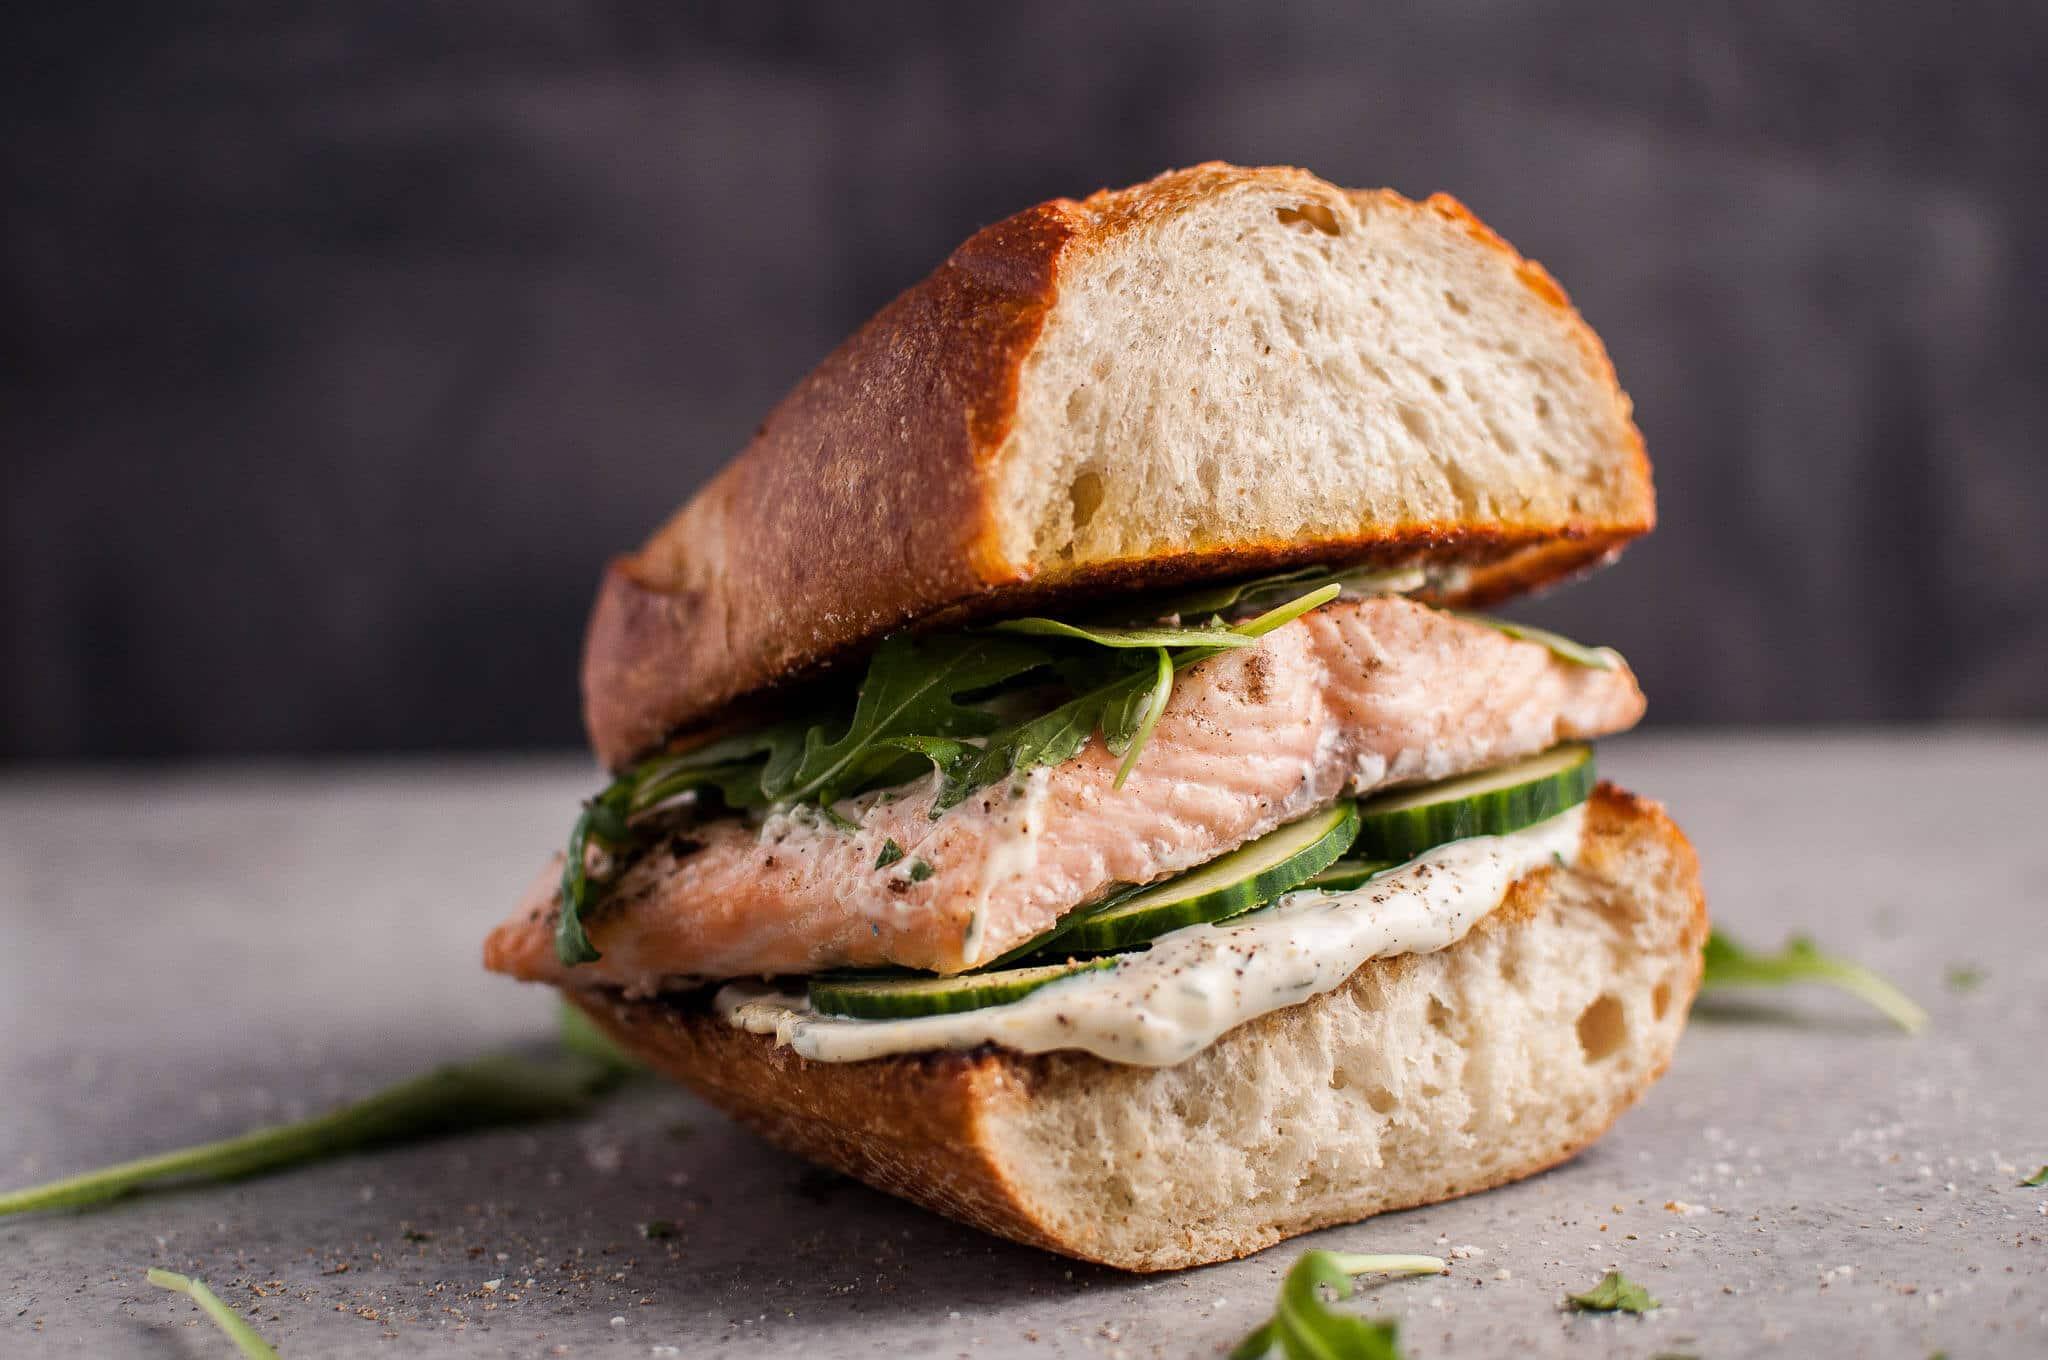 Easy Baked Salmon Sandwich With Zesty Lemon Mayo And